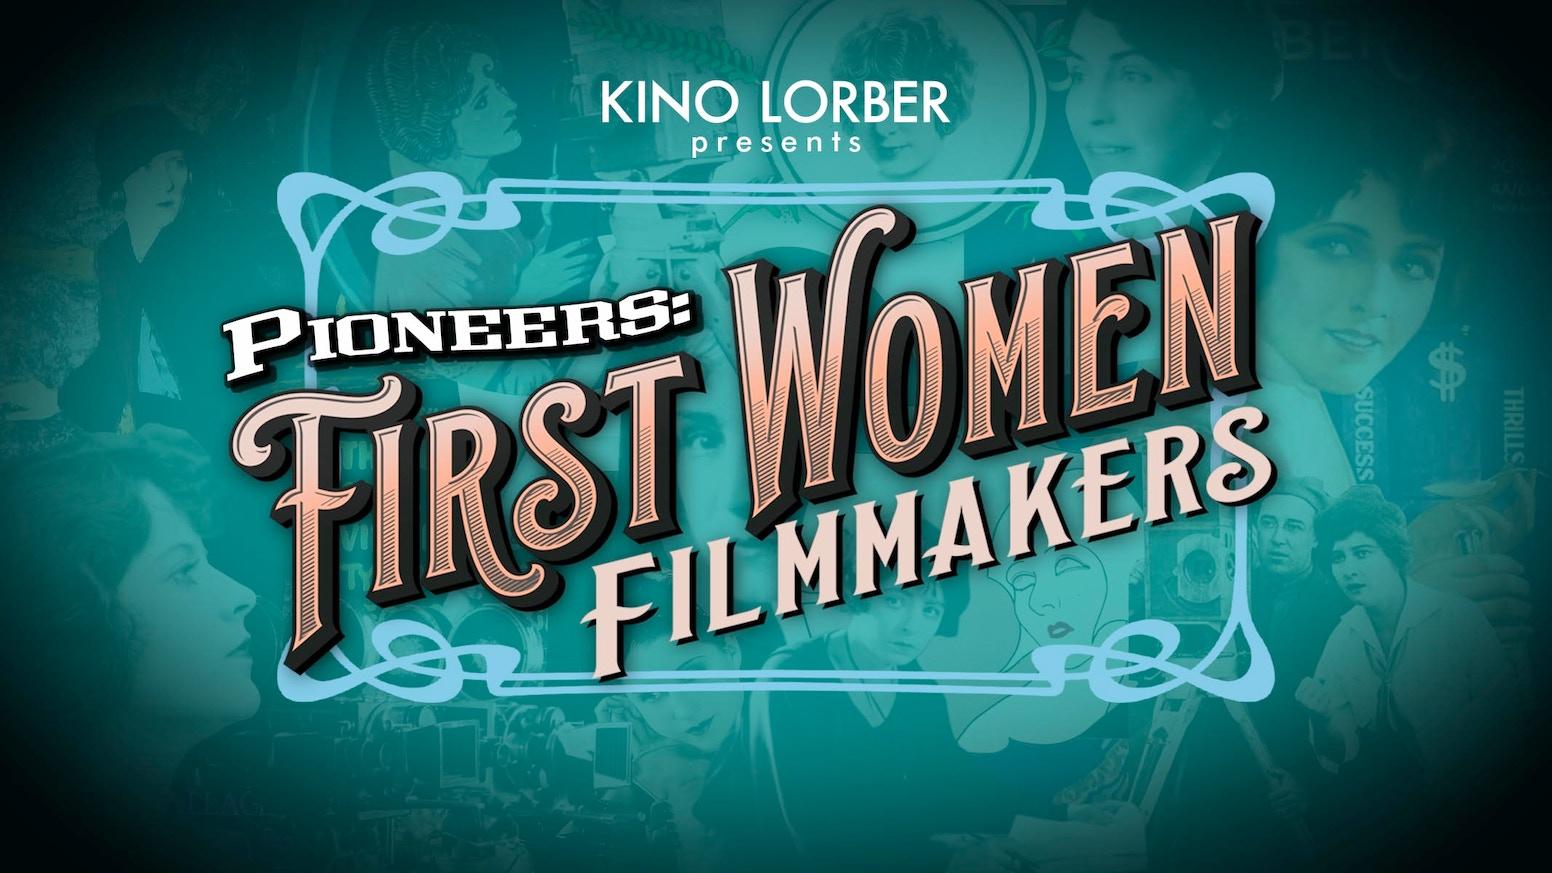 PIONEERS: FIRST WOMEN FILMMAKERS by Kino Lorber » FAQ